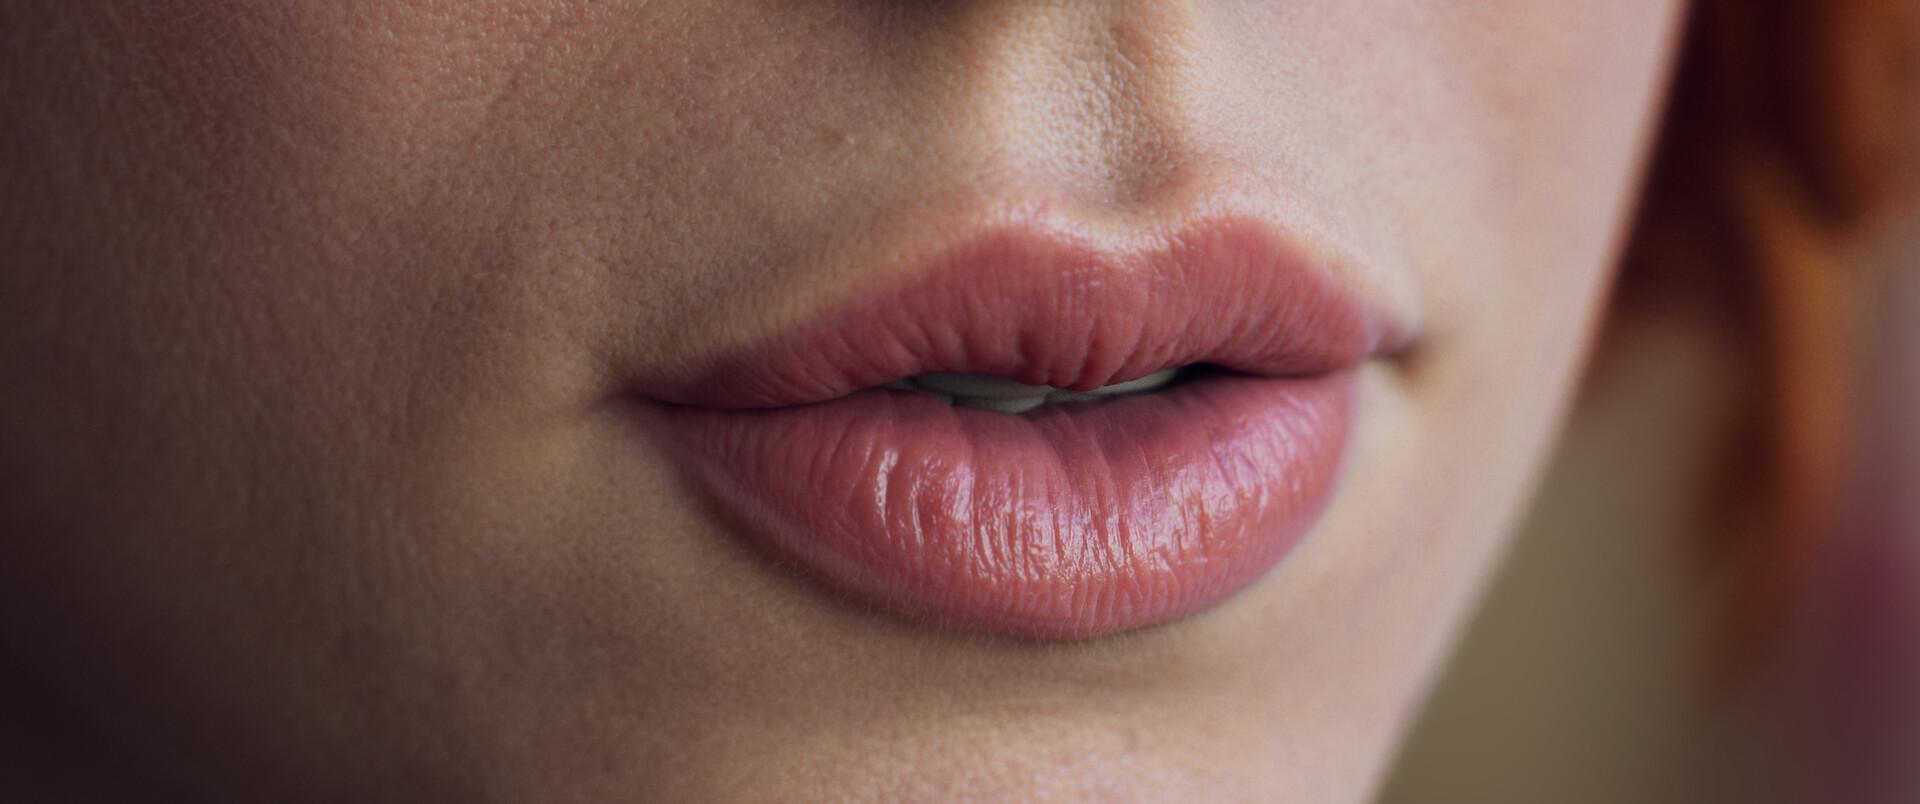 Abdelrahman kubisi lips closeup